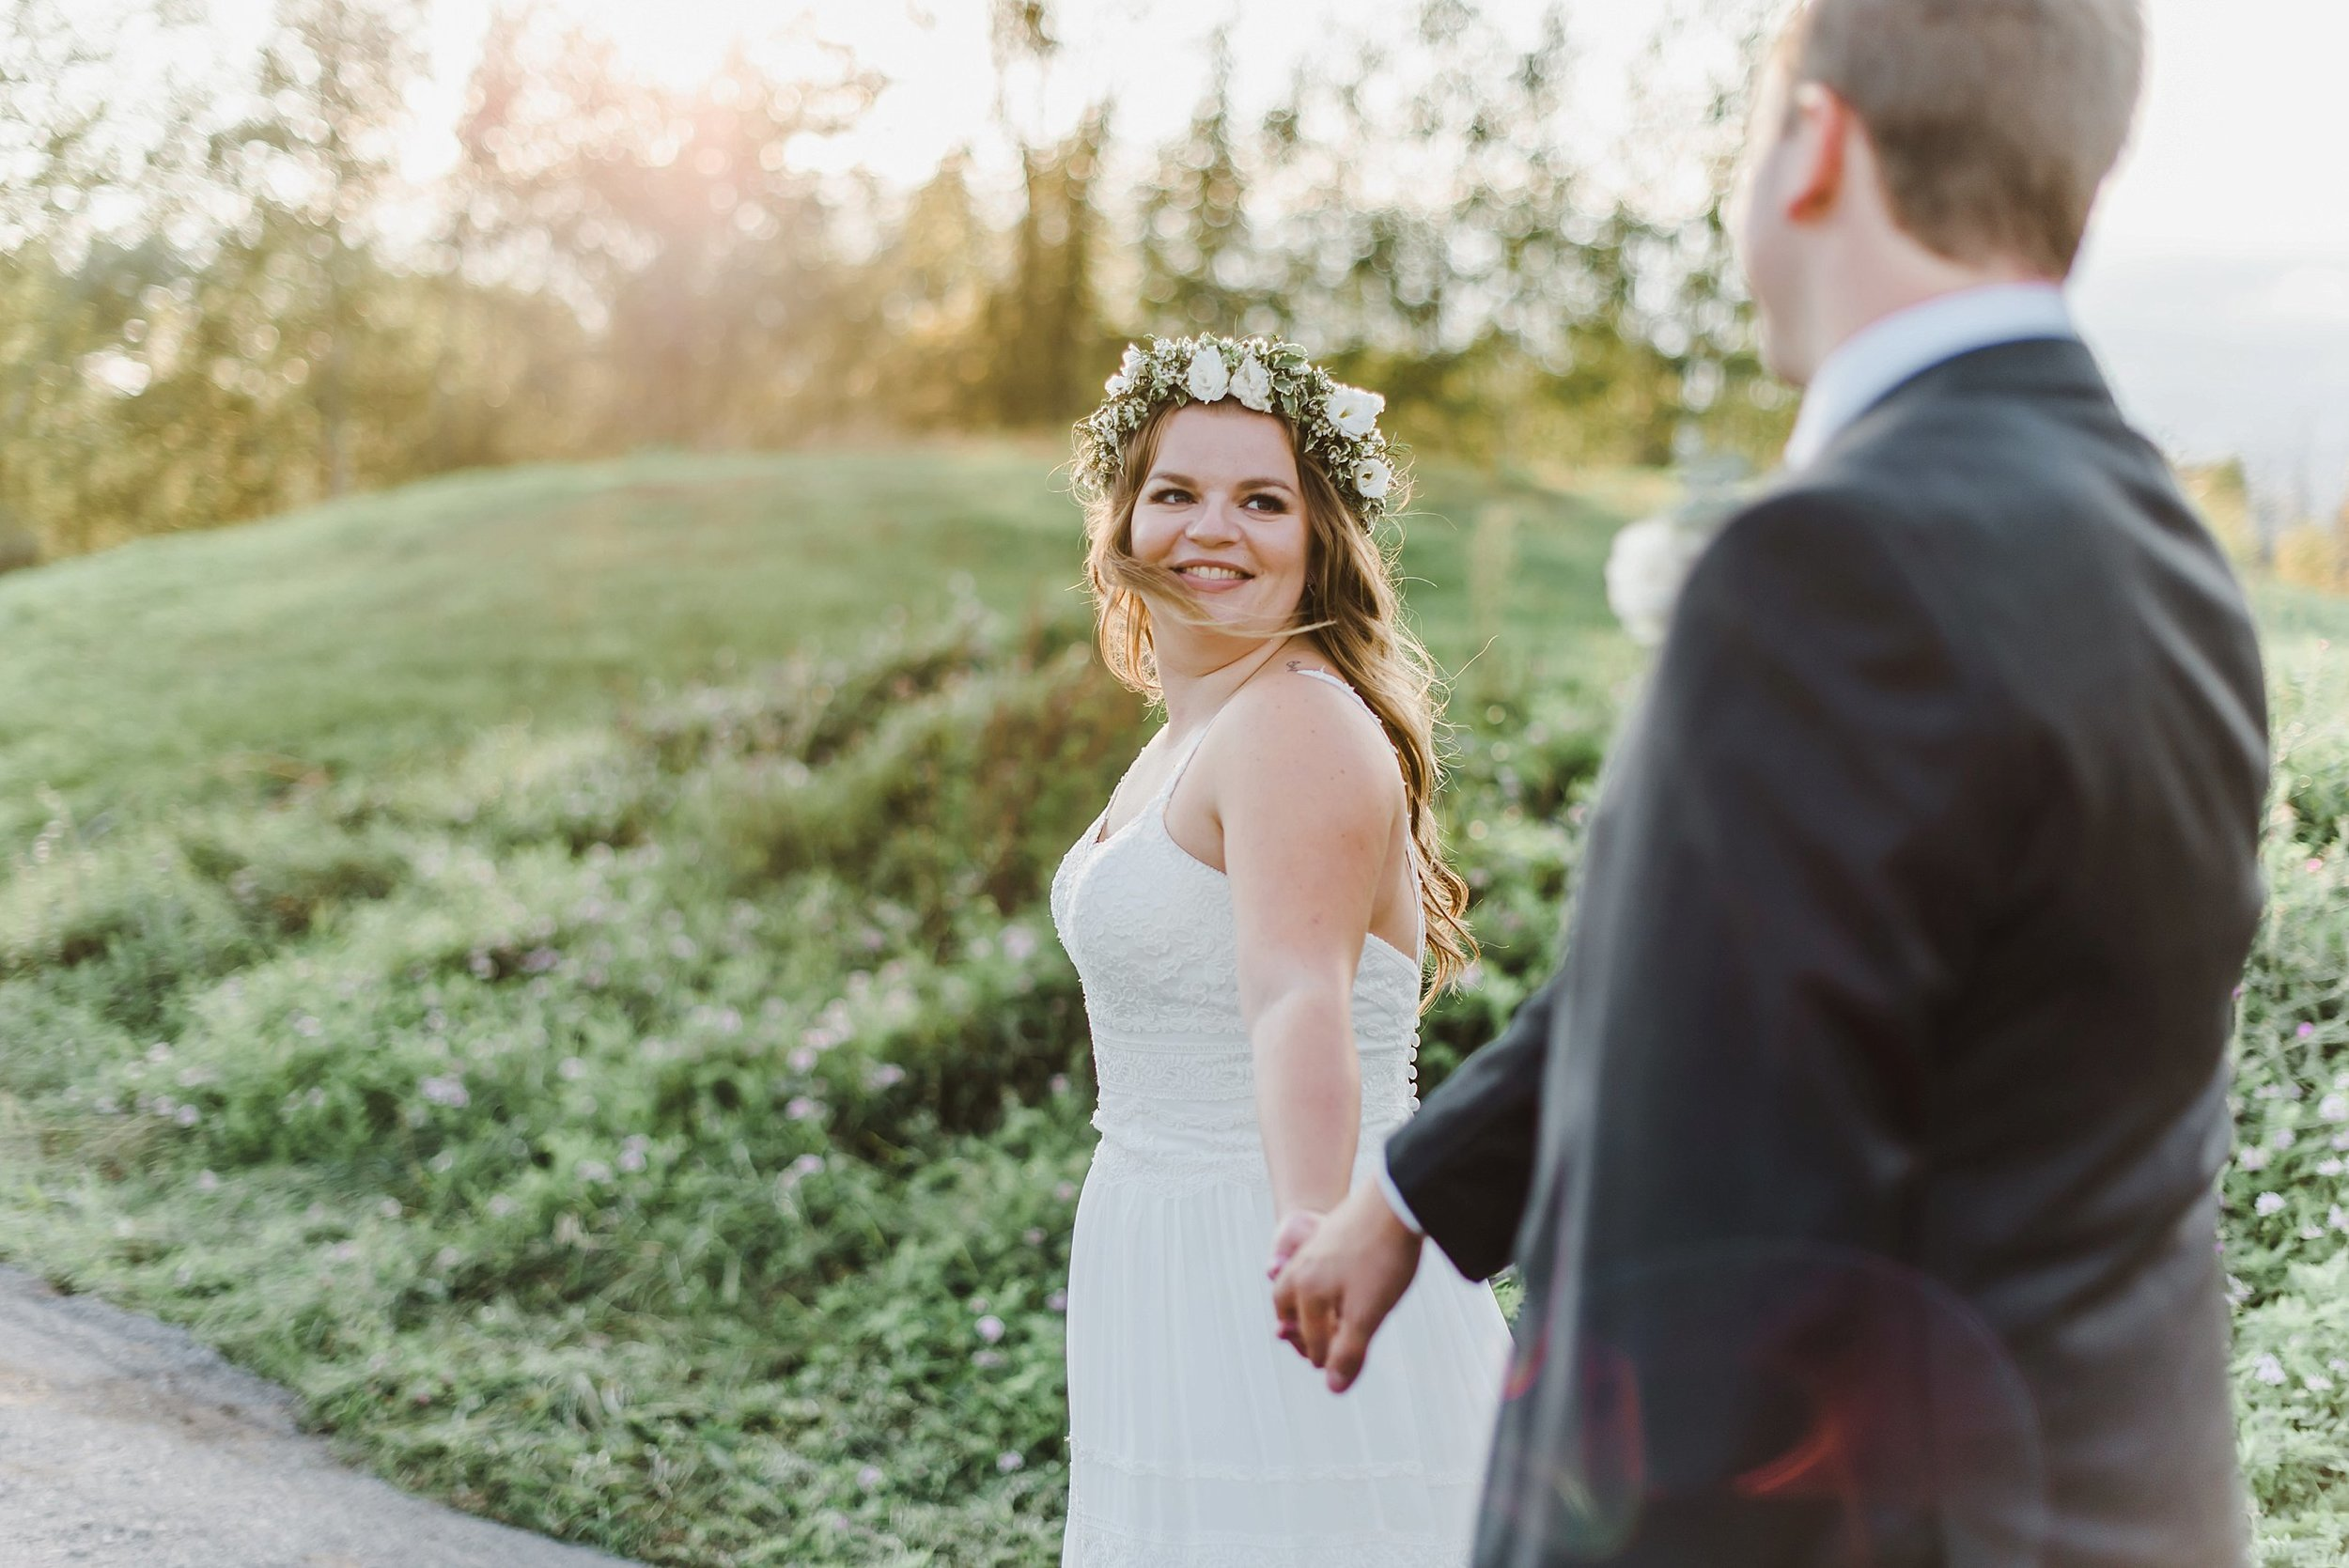 light airy indie fine art ottawa wedding photographer | Ali and Batoul Photography_1197.jpg